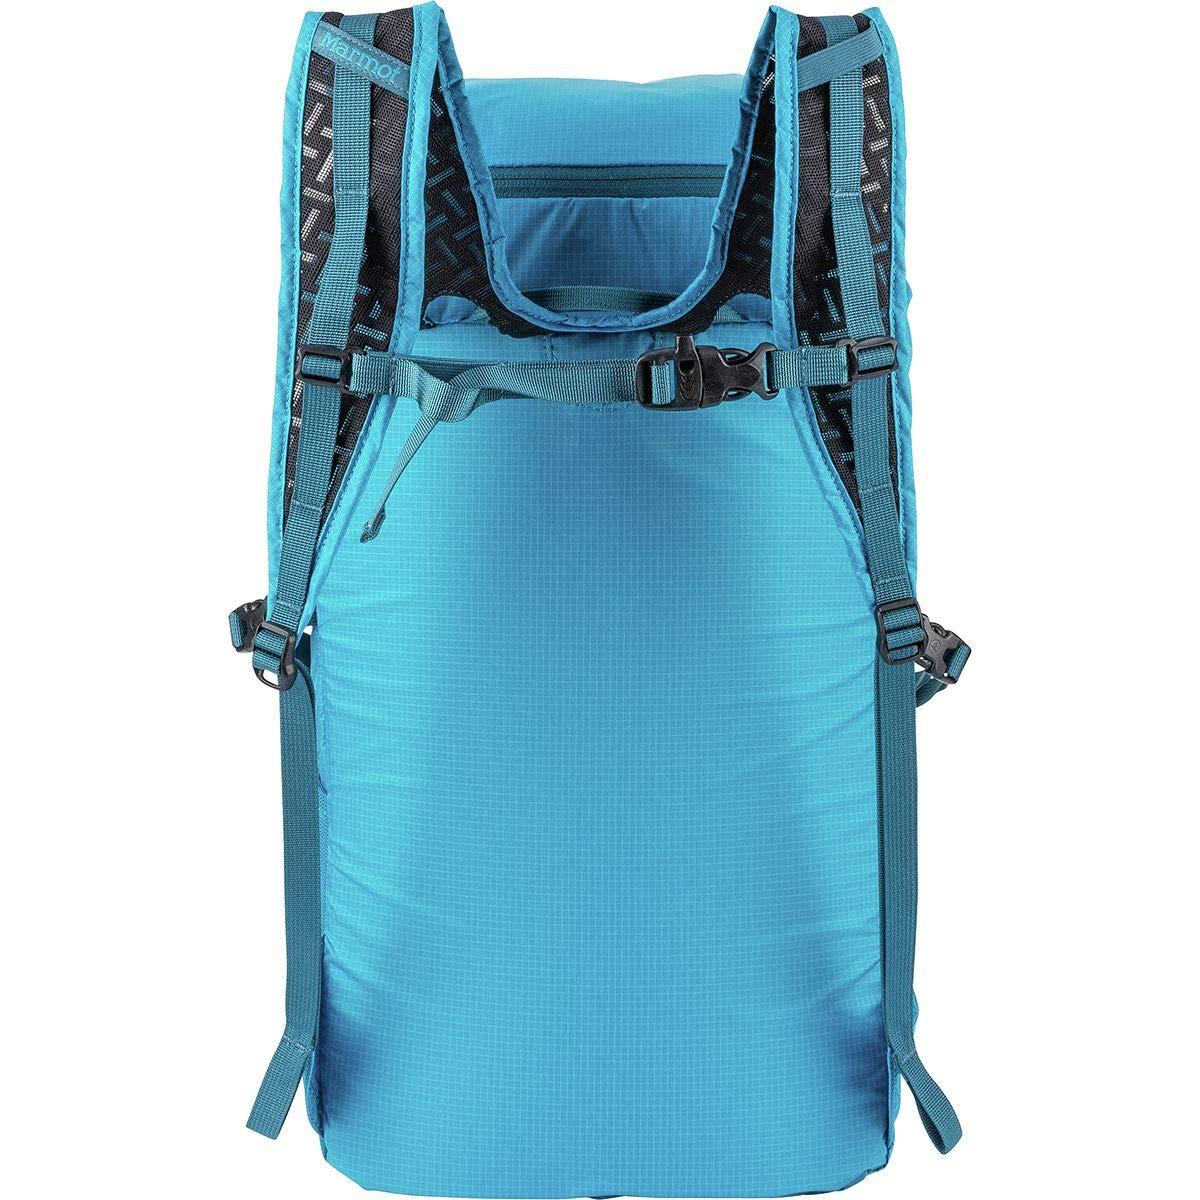 Daypack Marmot Kompressor 18 L Capacity Weighs Only 290g Ultra Light Backpack Foldable Rucksack